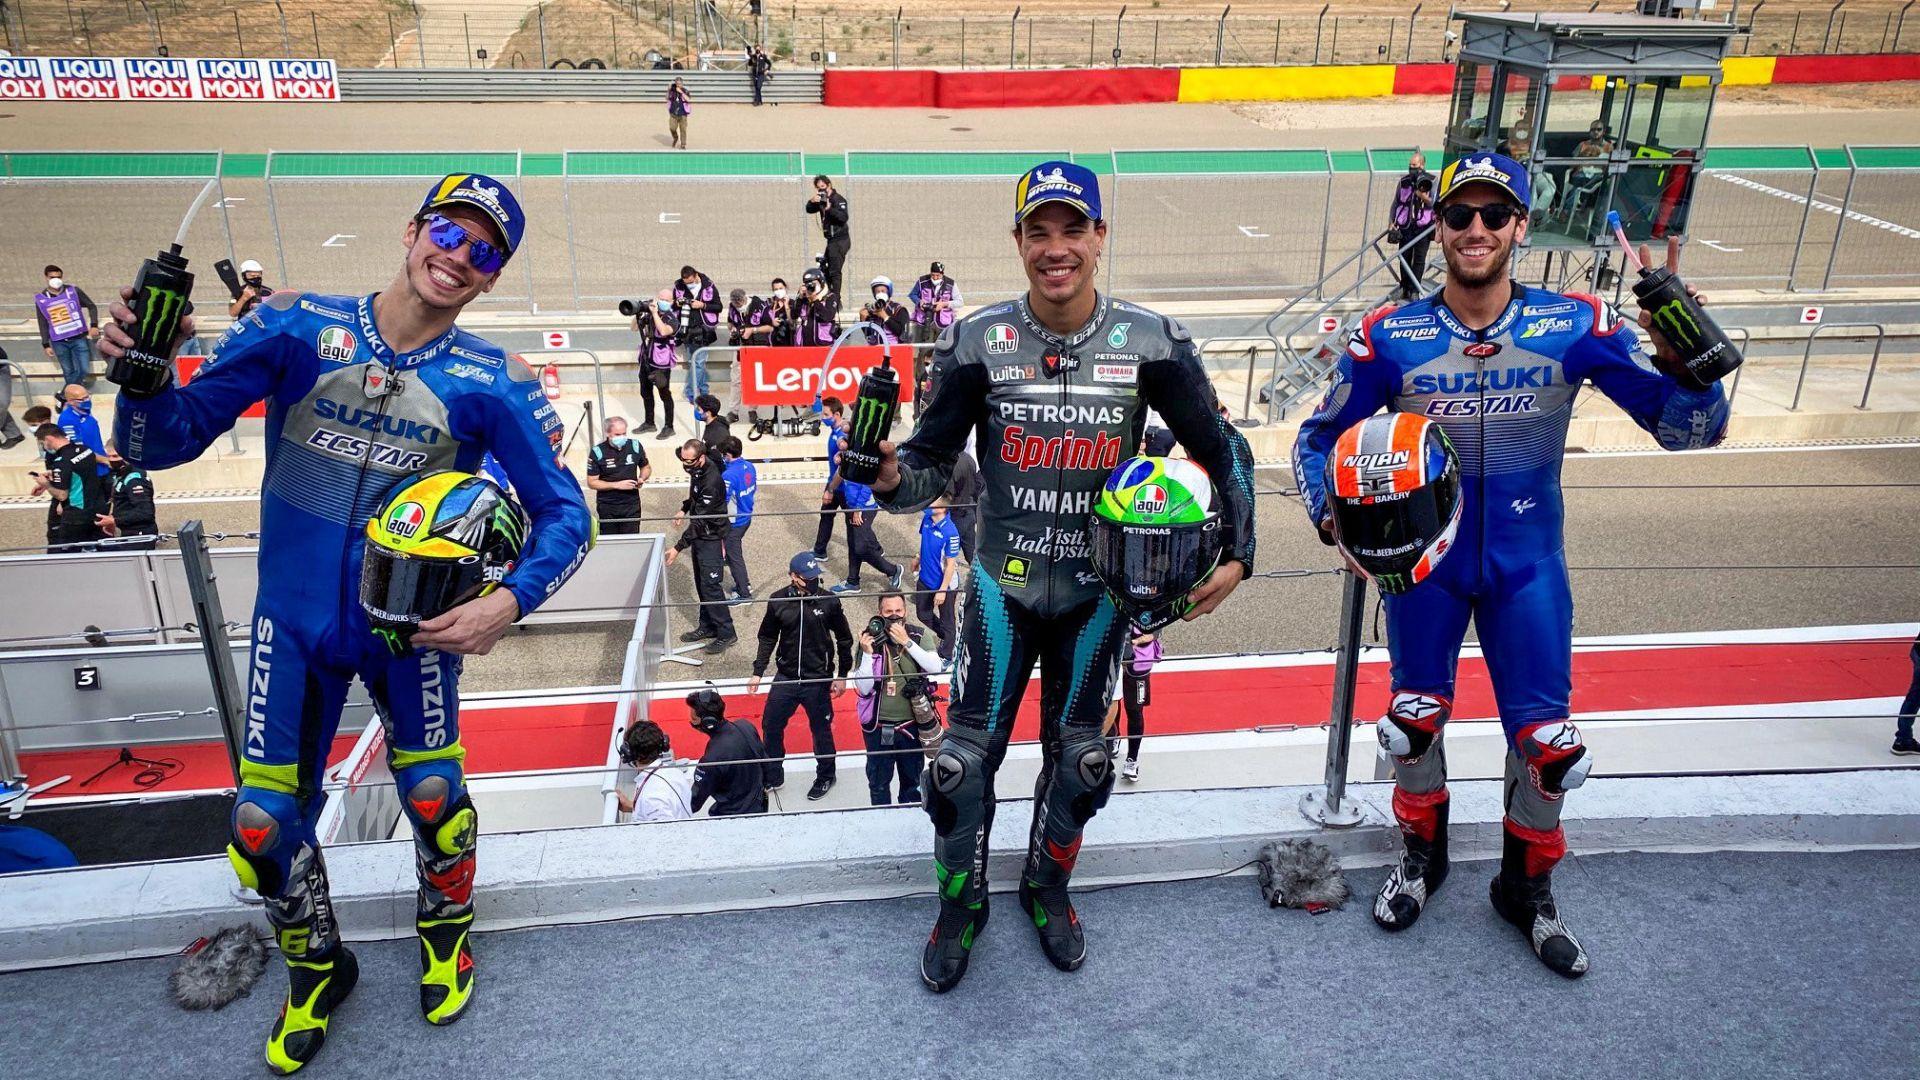 MotoGP Teruel 2020, le pagelle di Alcaniz